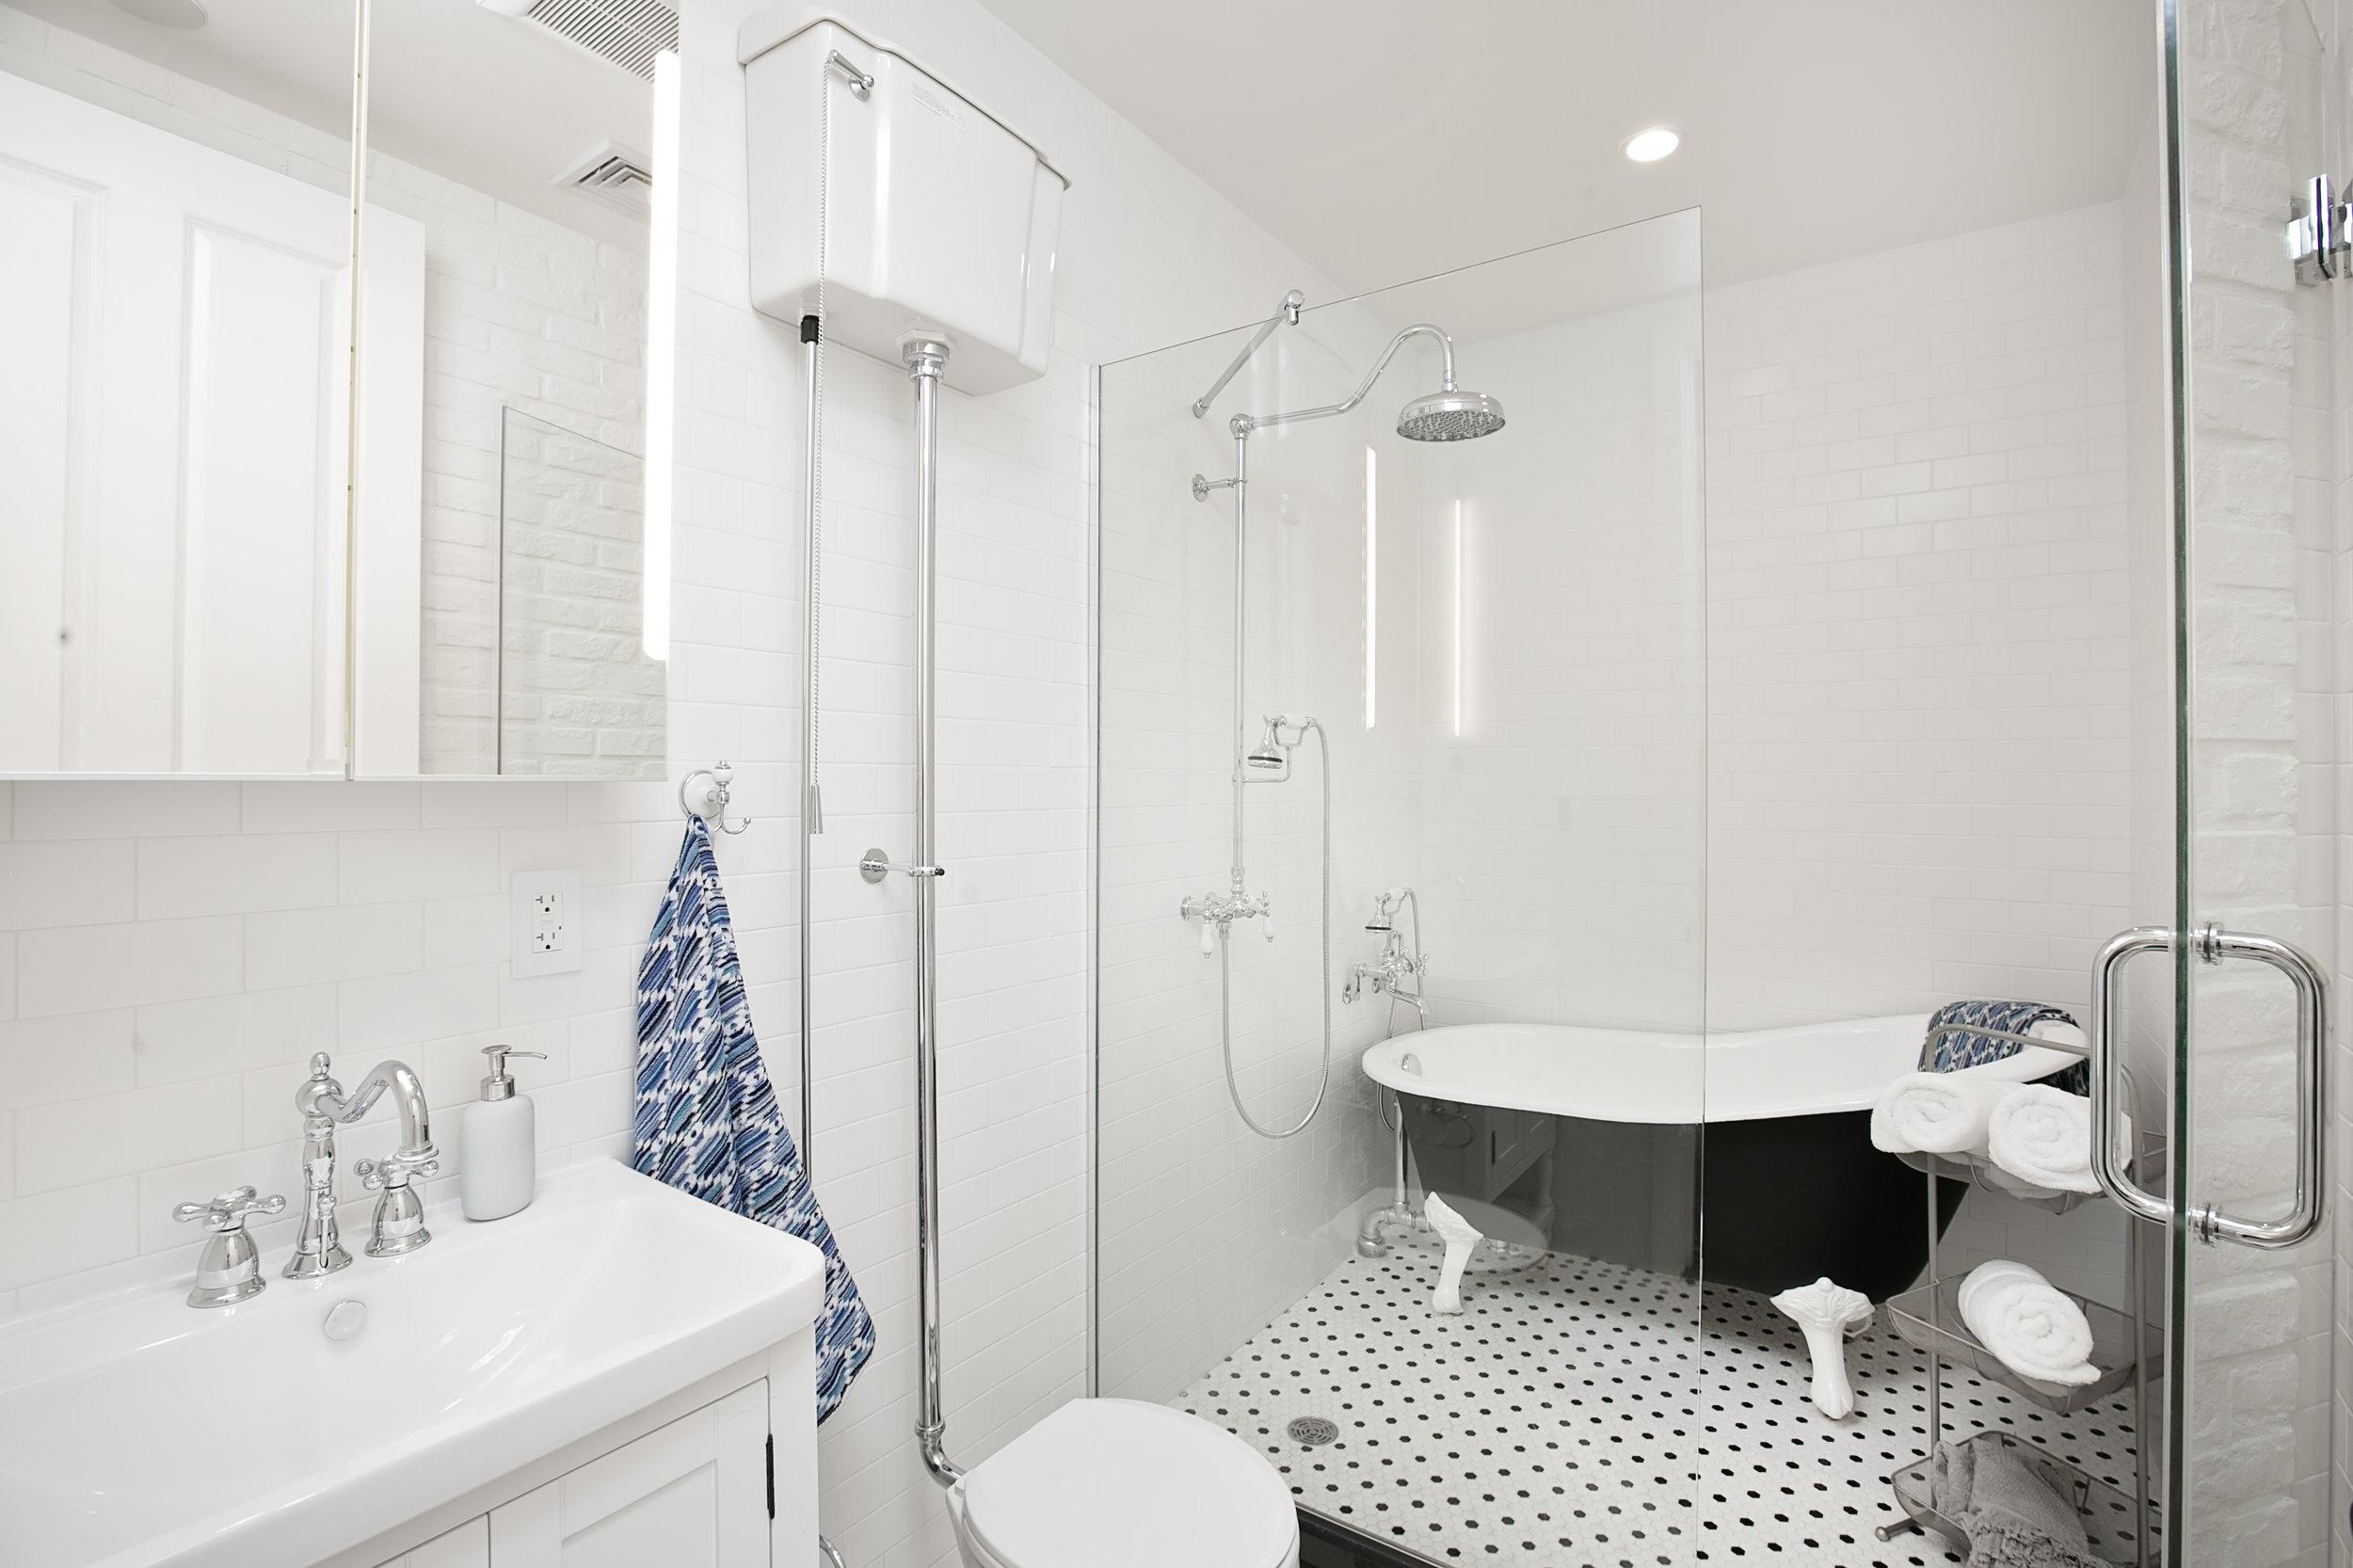 THE BATHROOM - Vintage, but modern!